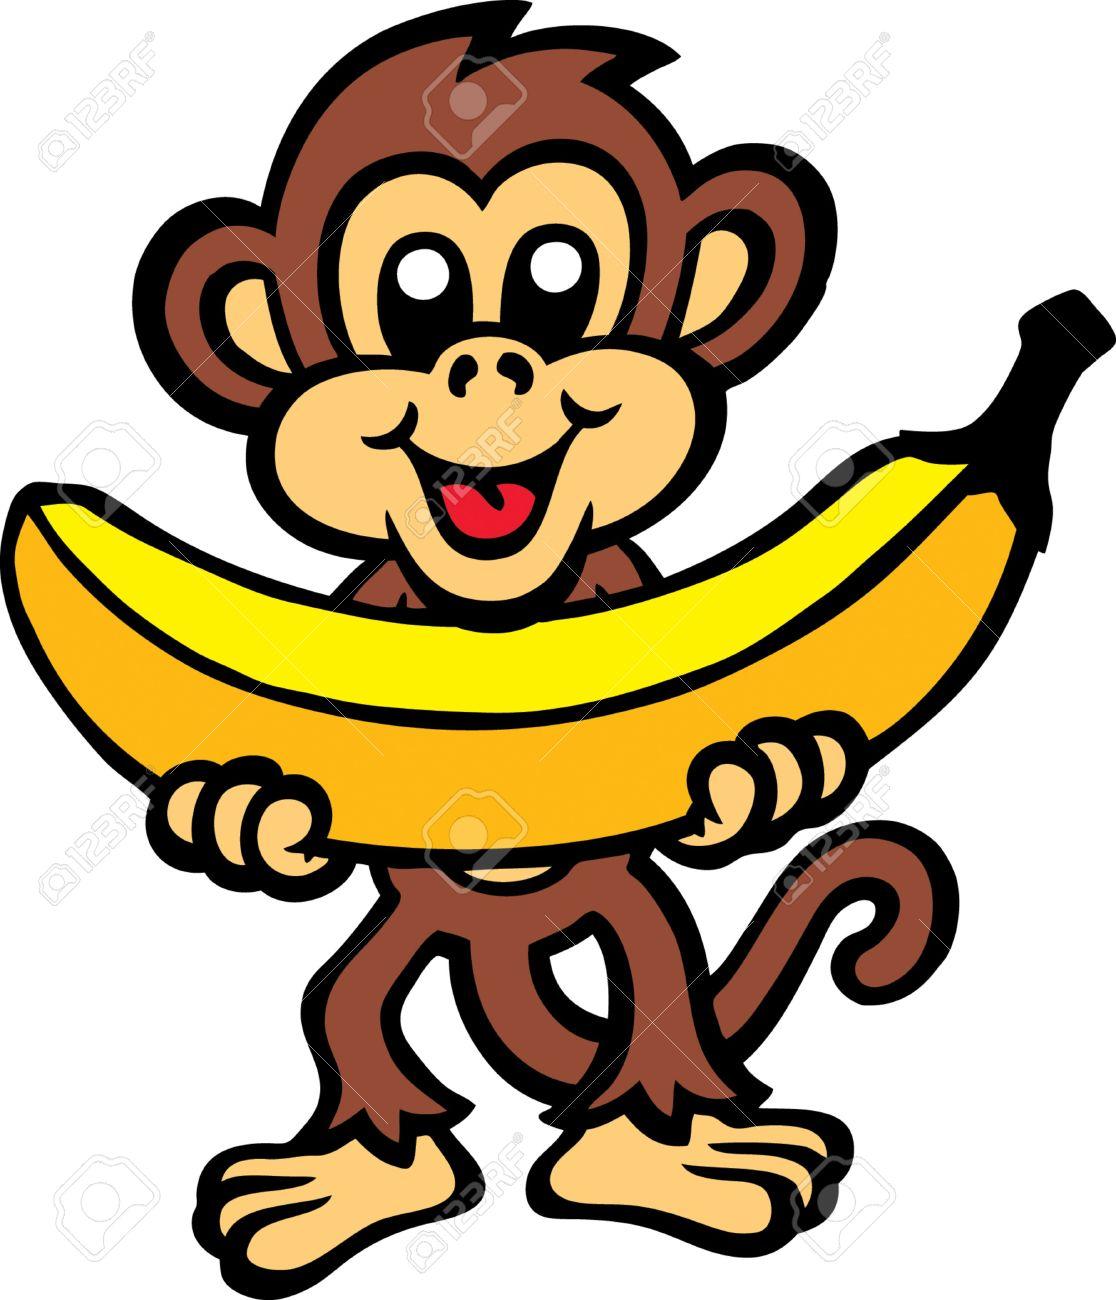 Monkey Banana.